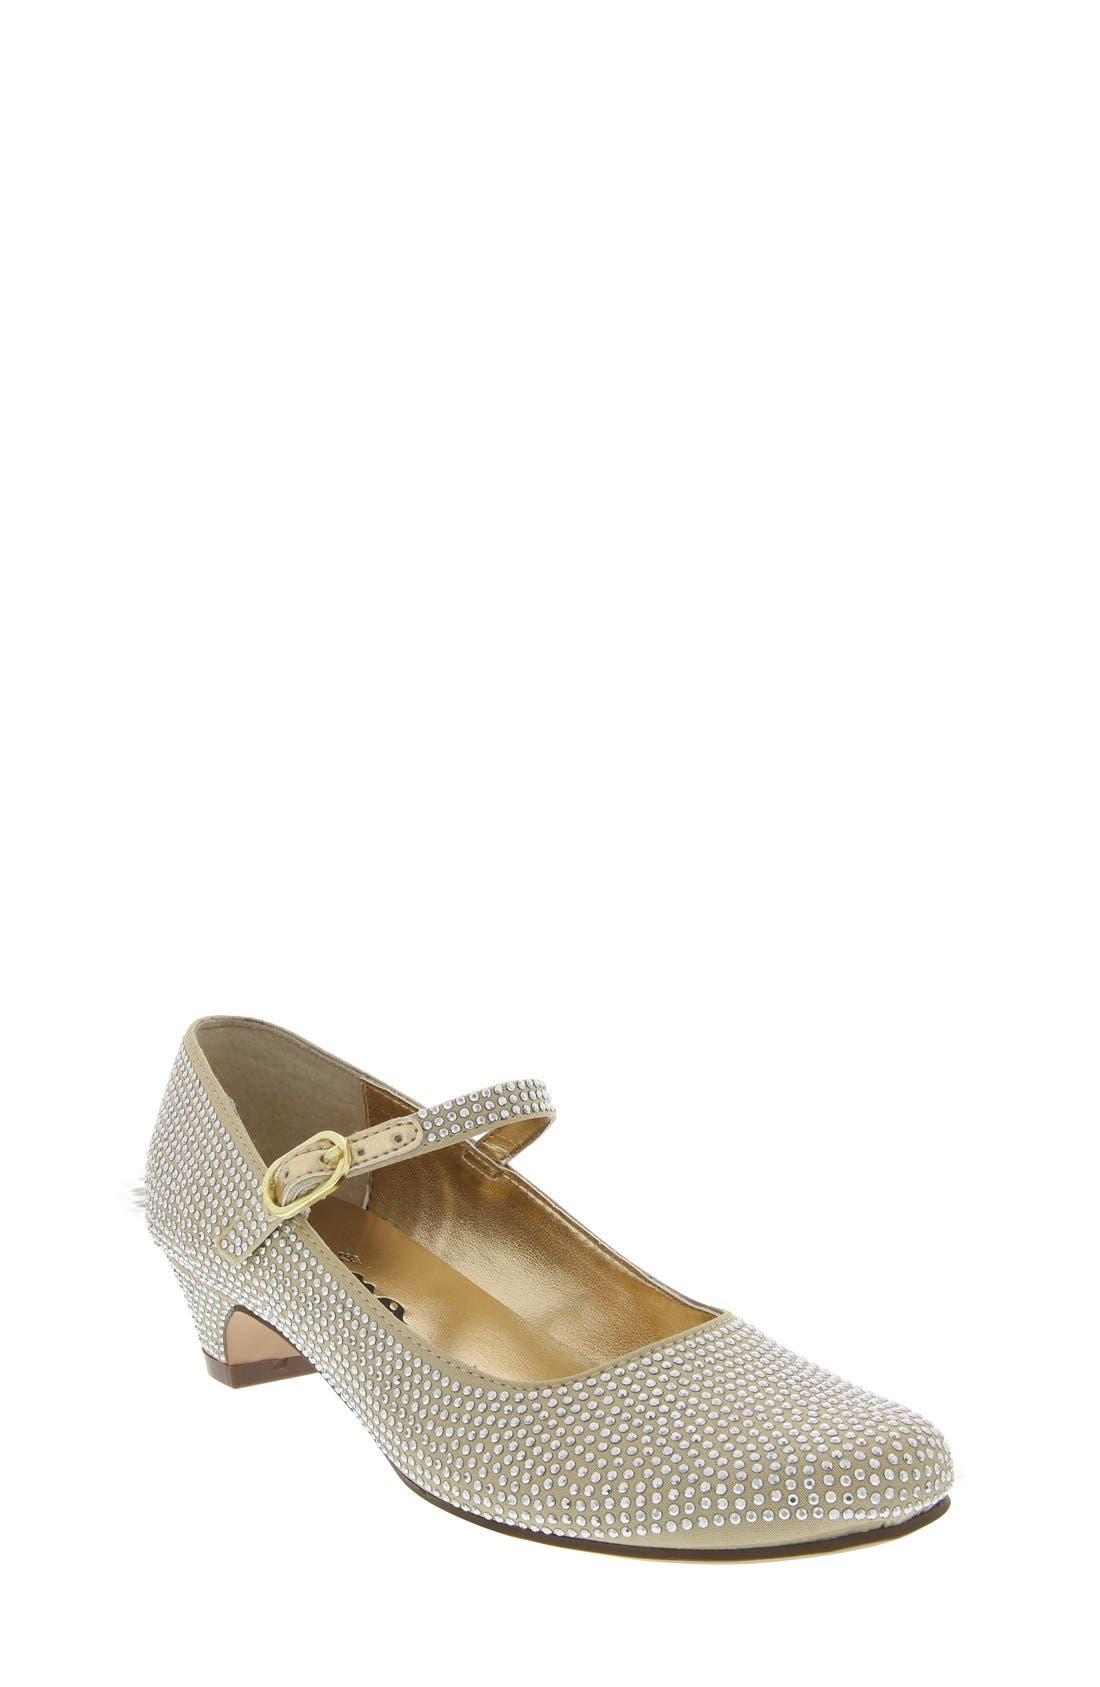 Girls' Nina Shoes